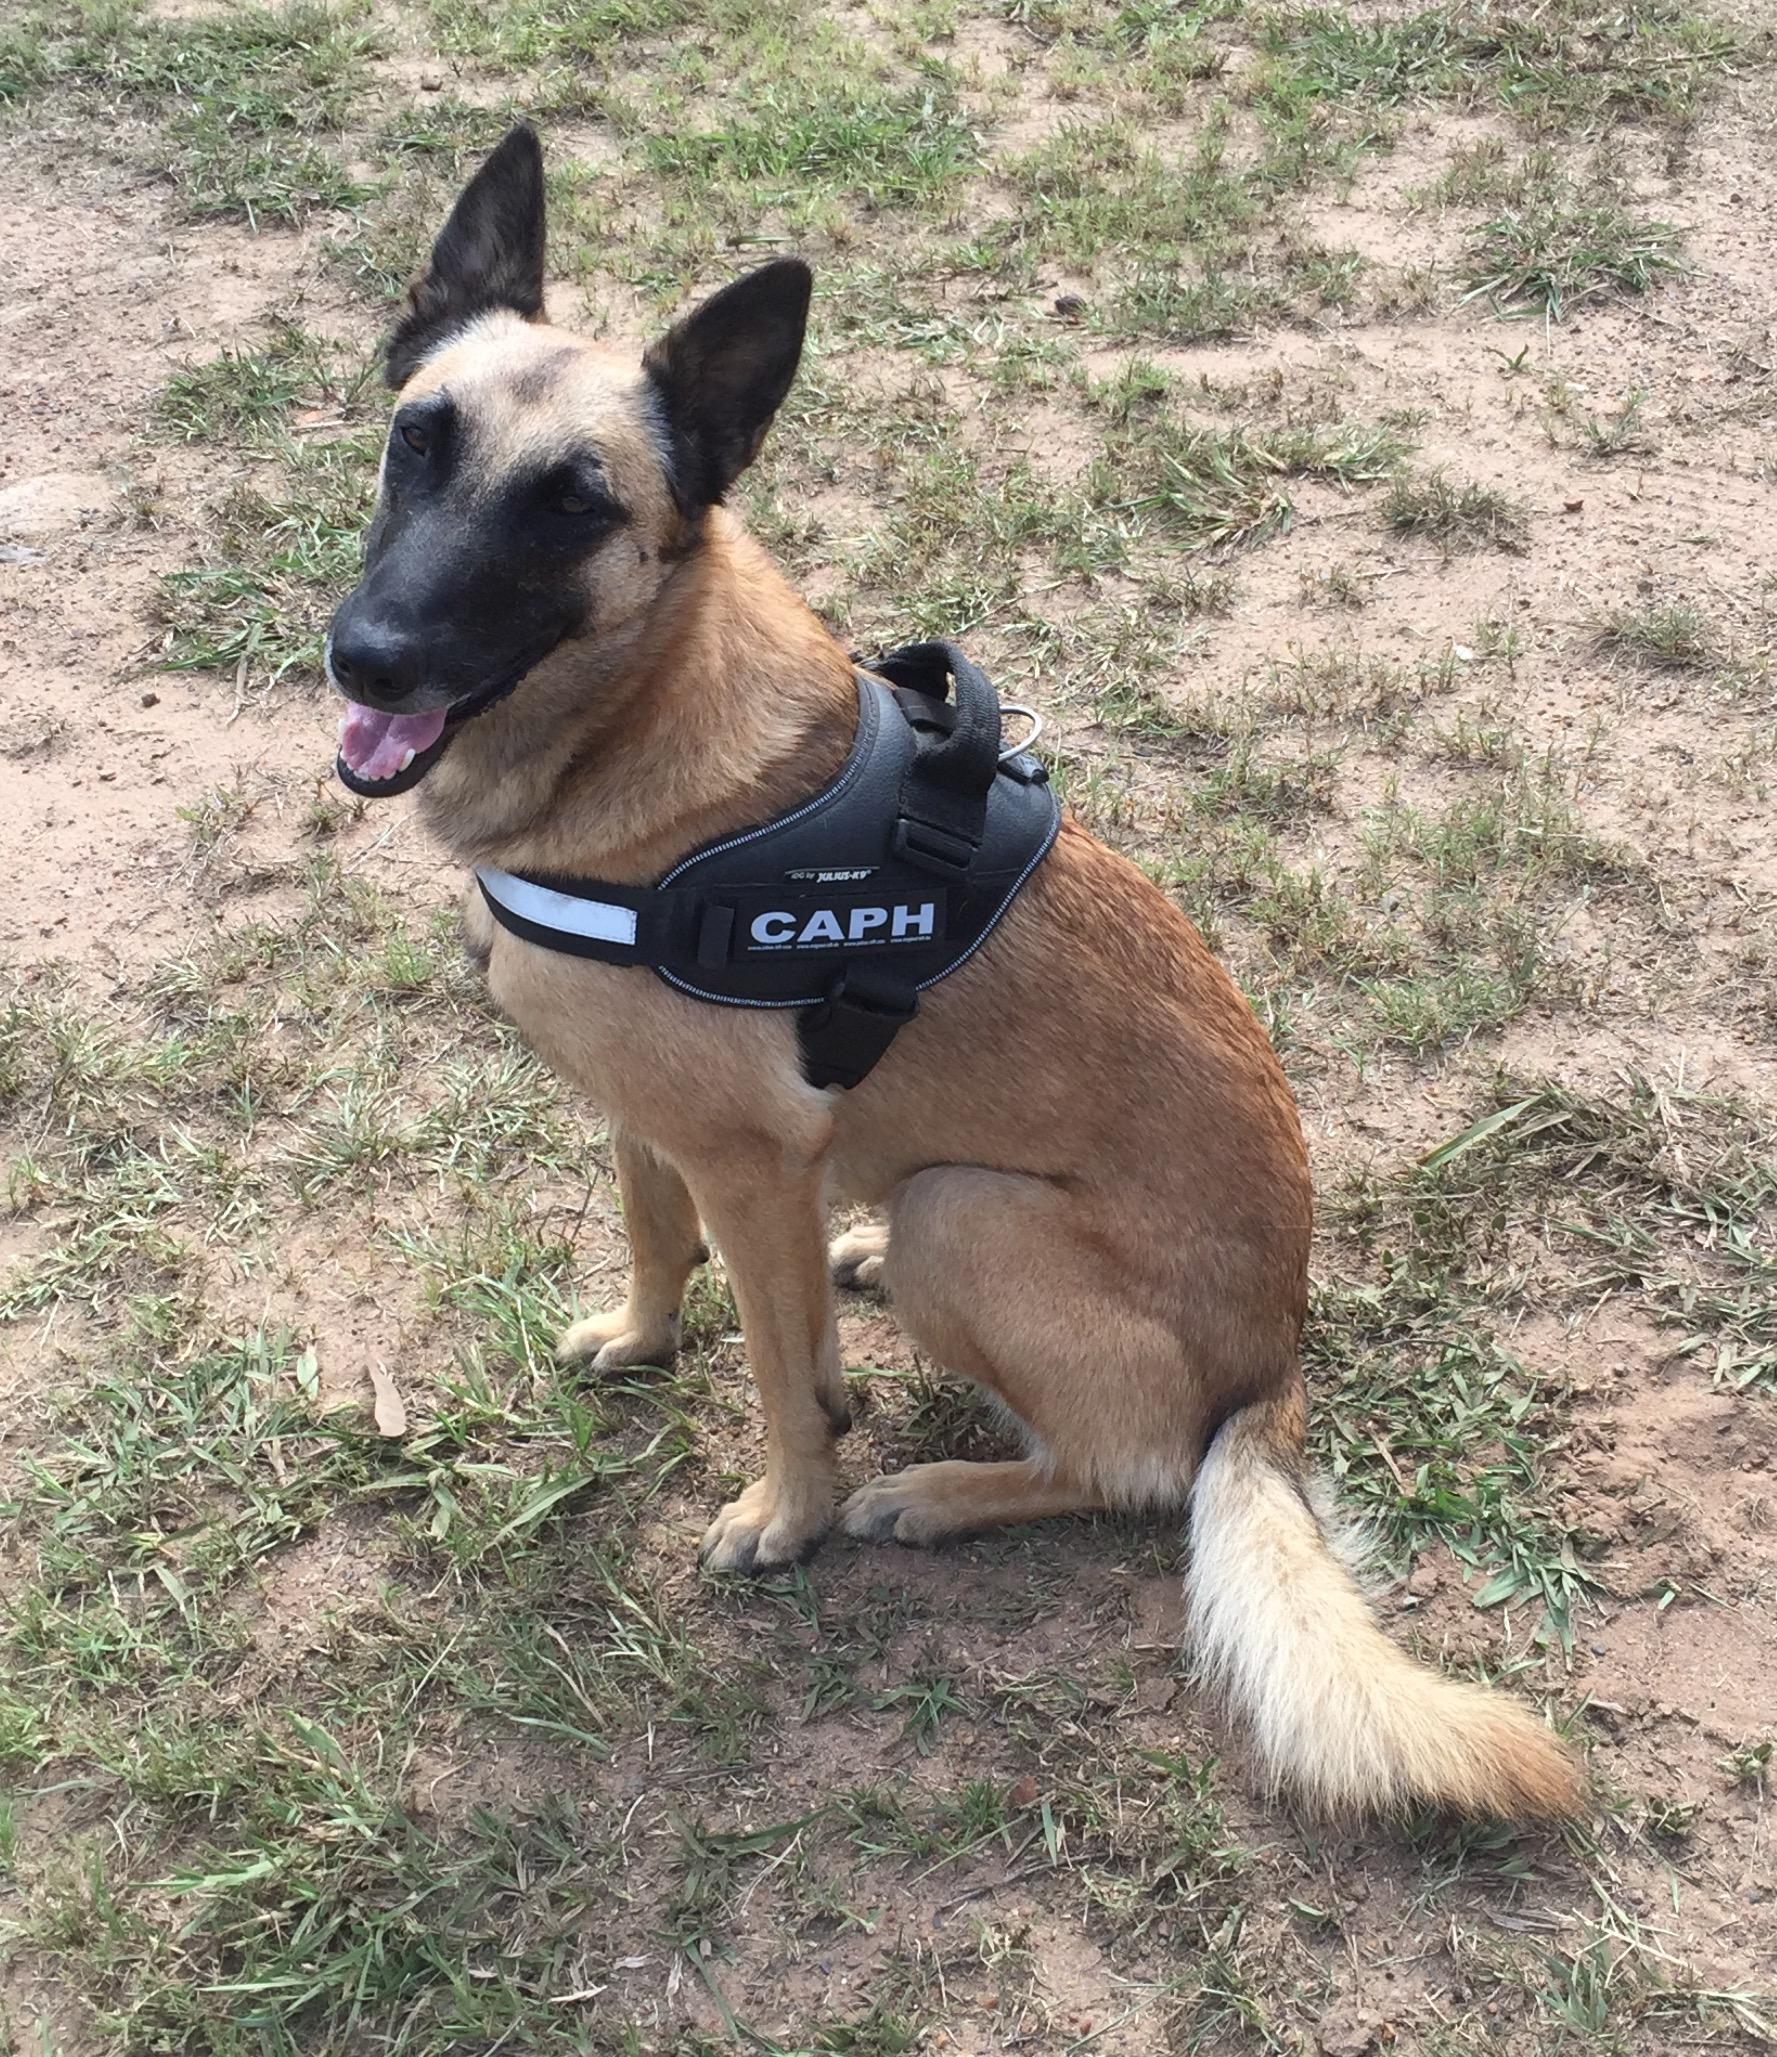 Caph in uniform